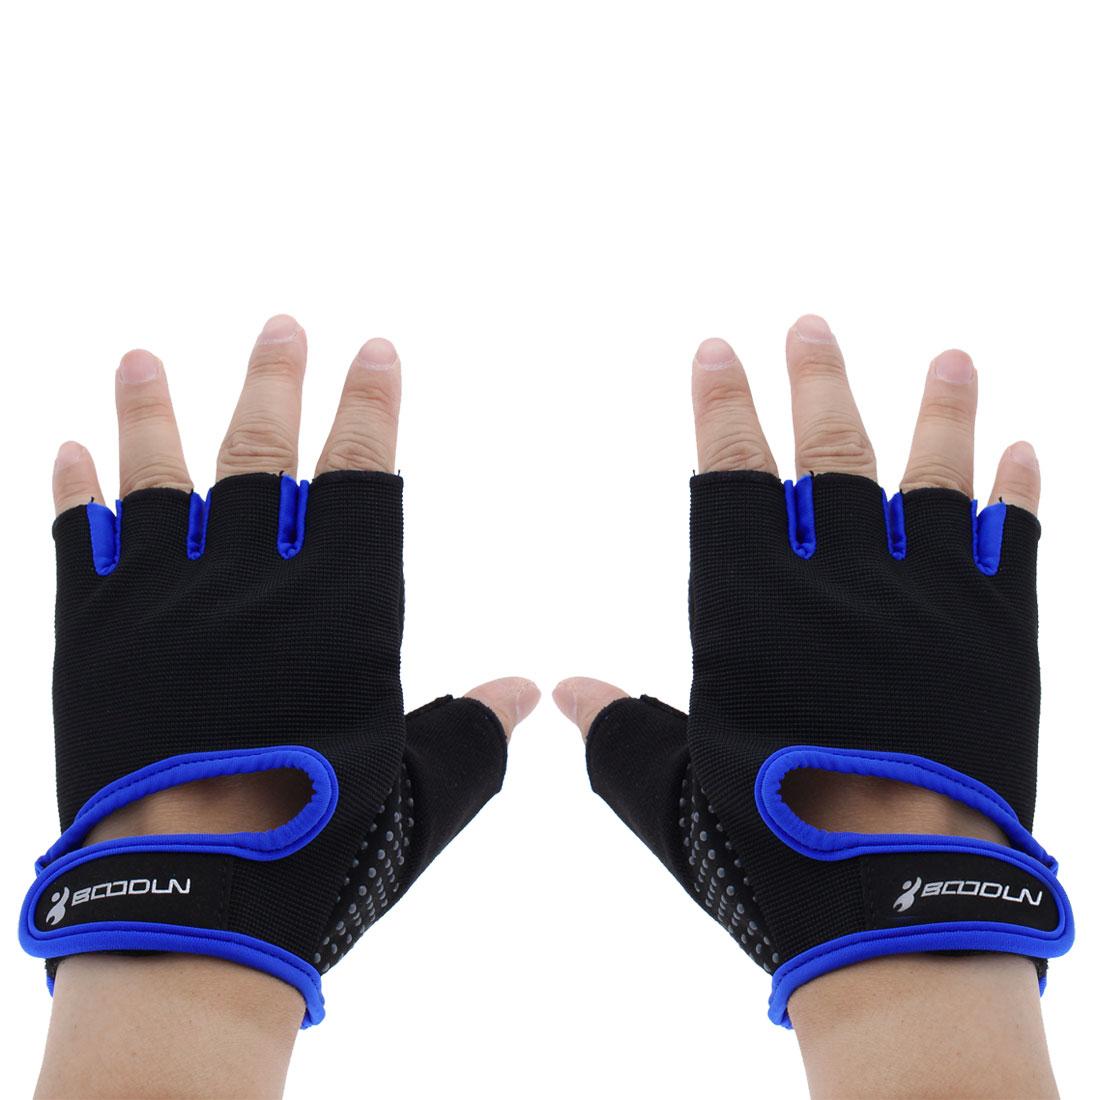 BOODUN Authorized Exercise Weight Biking Lifting Training Microfiber Non-slip Fitness Half Finger Gloves Blue S